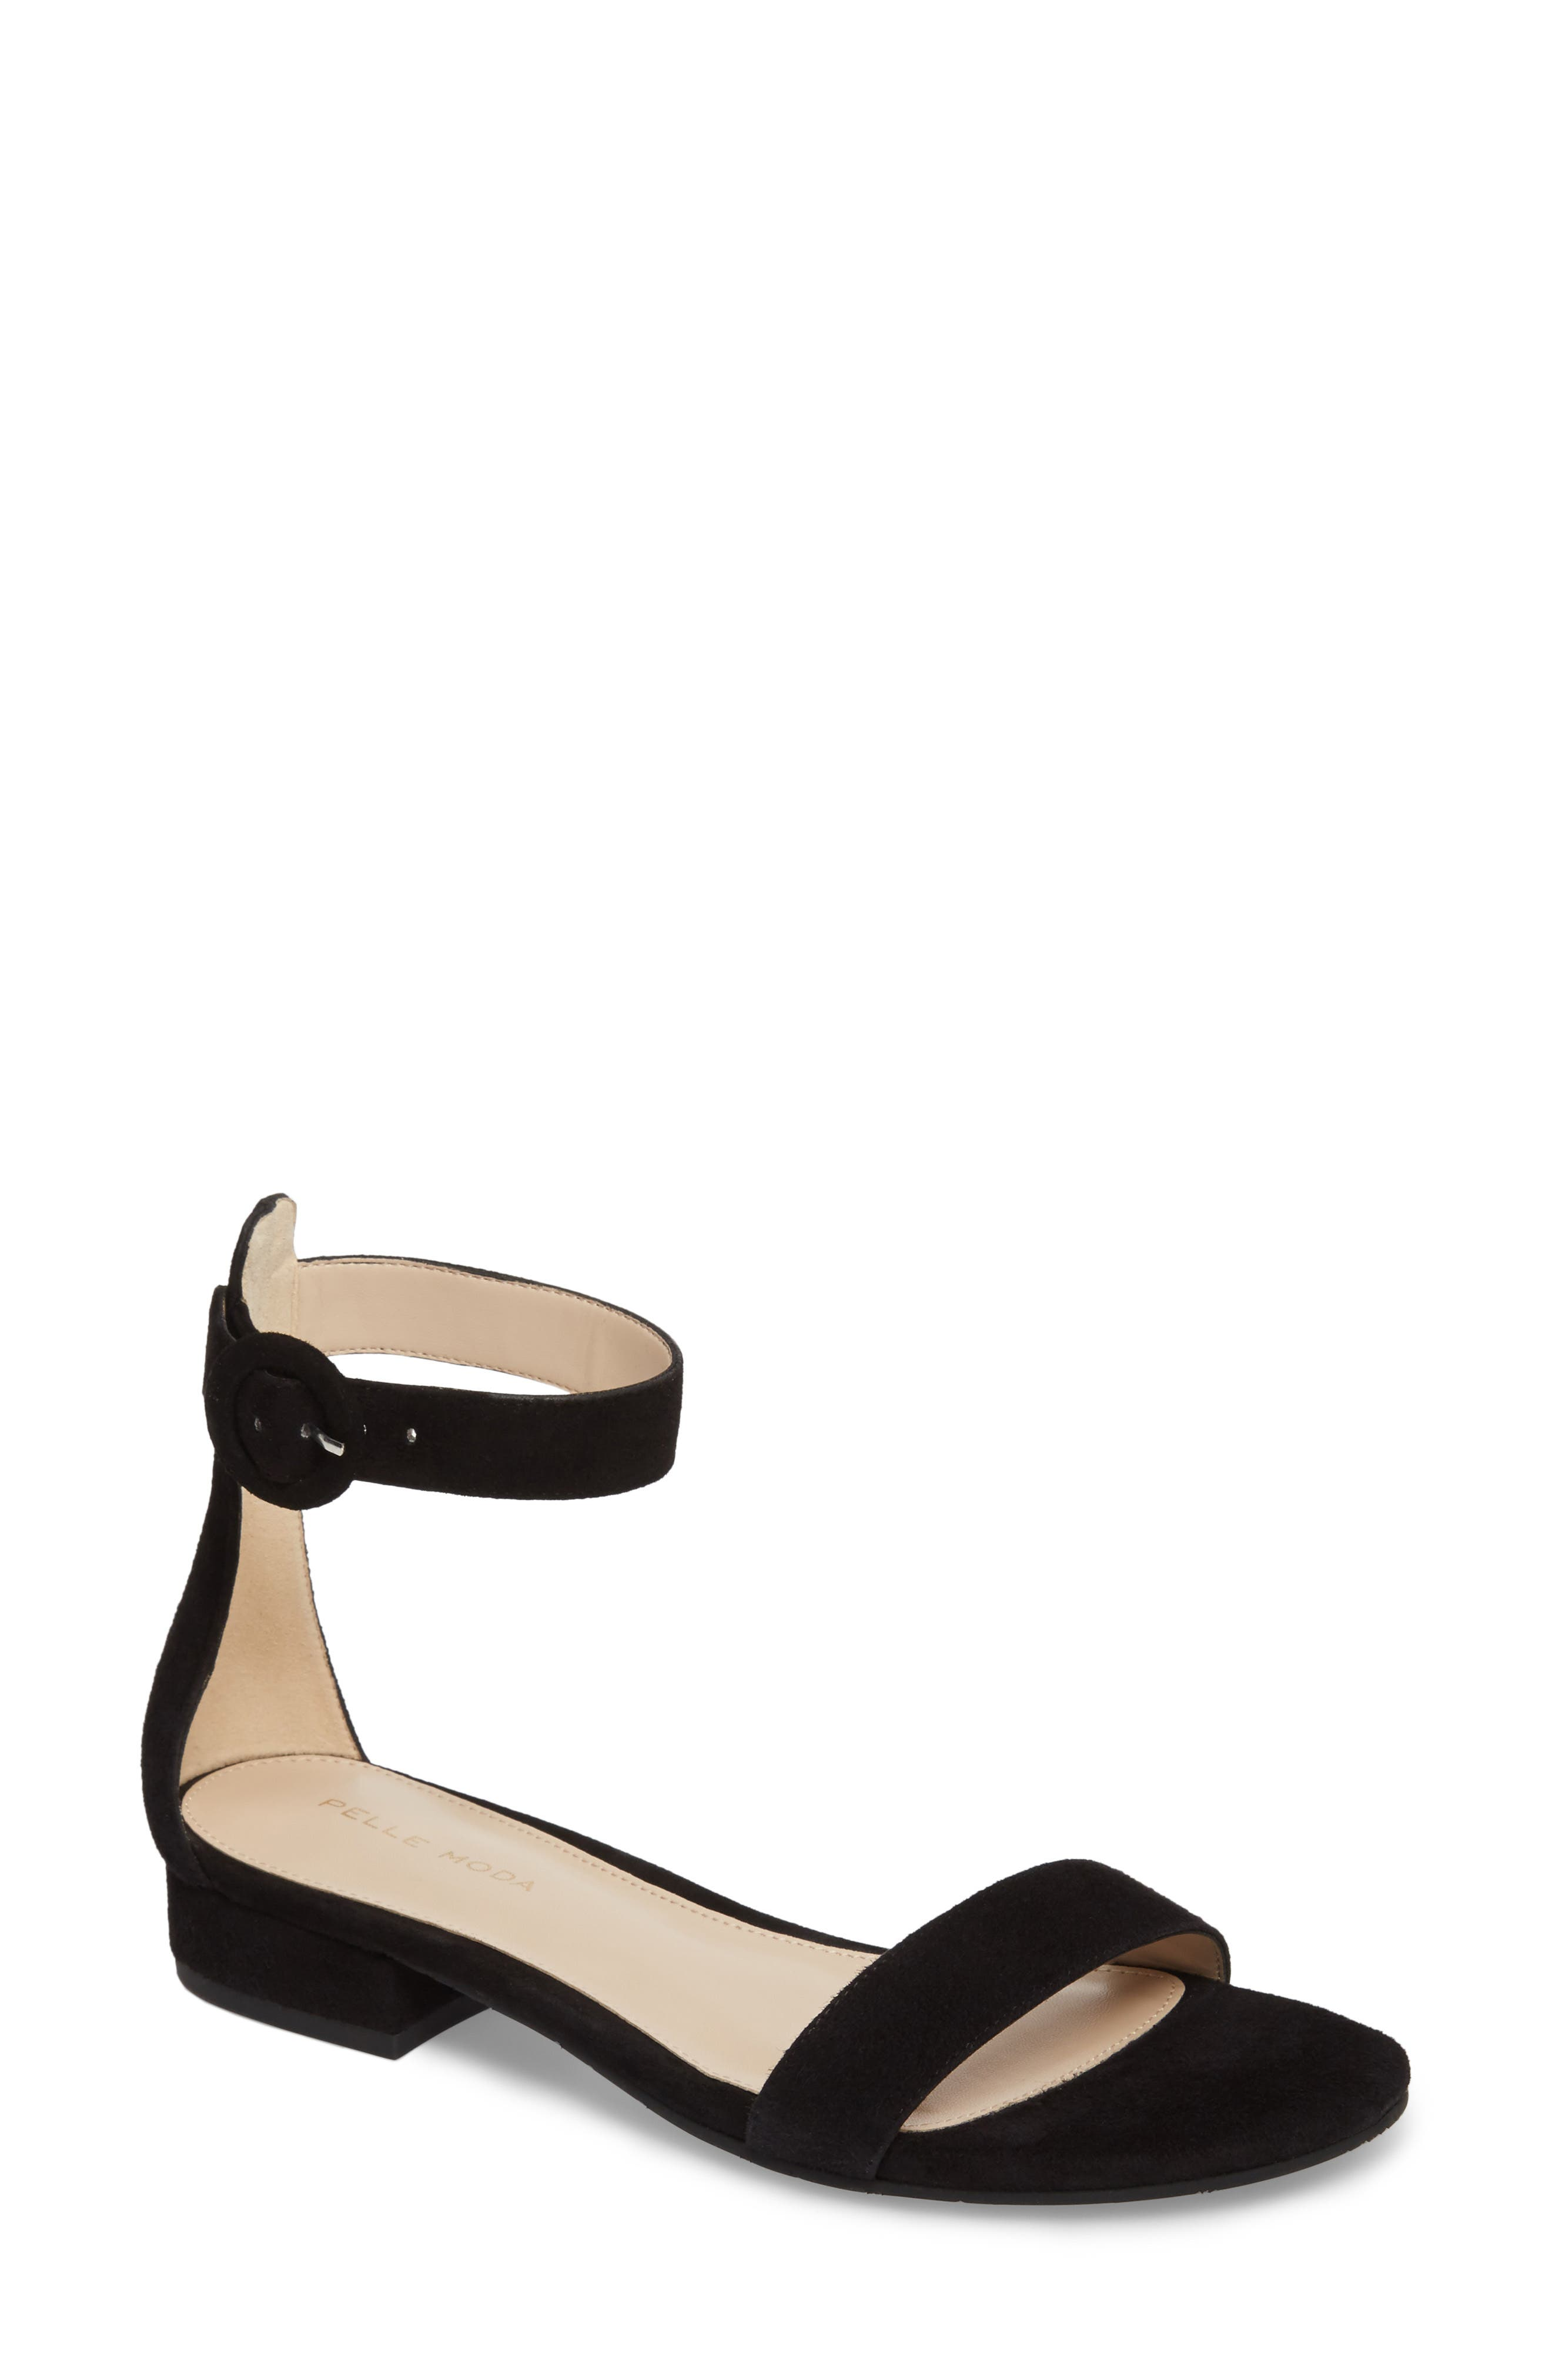 PELLE MODA Newport Sandal, Main, color, BLACK SUEDE